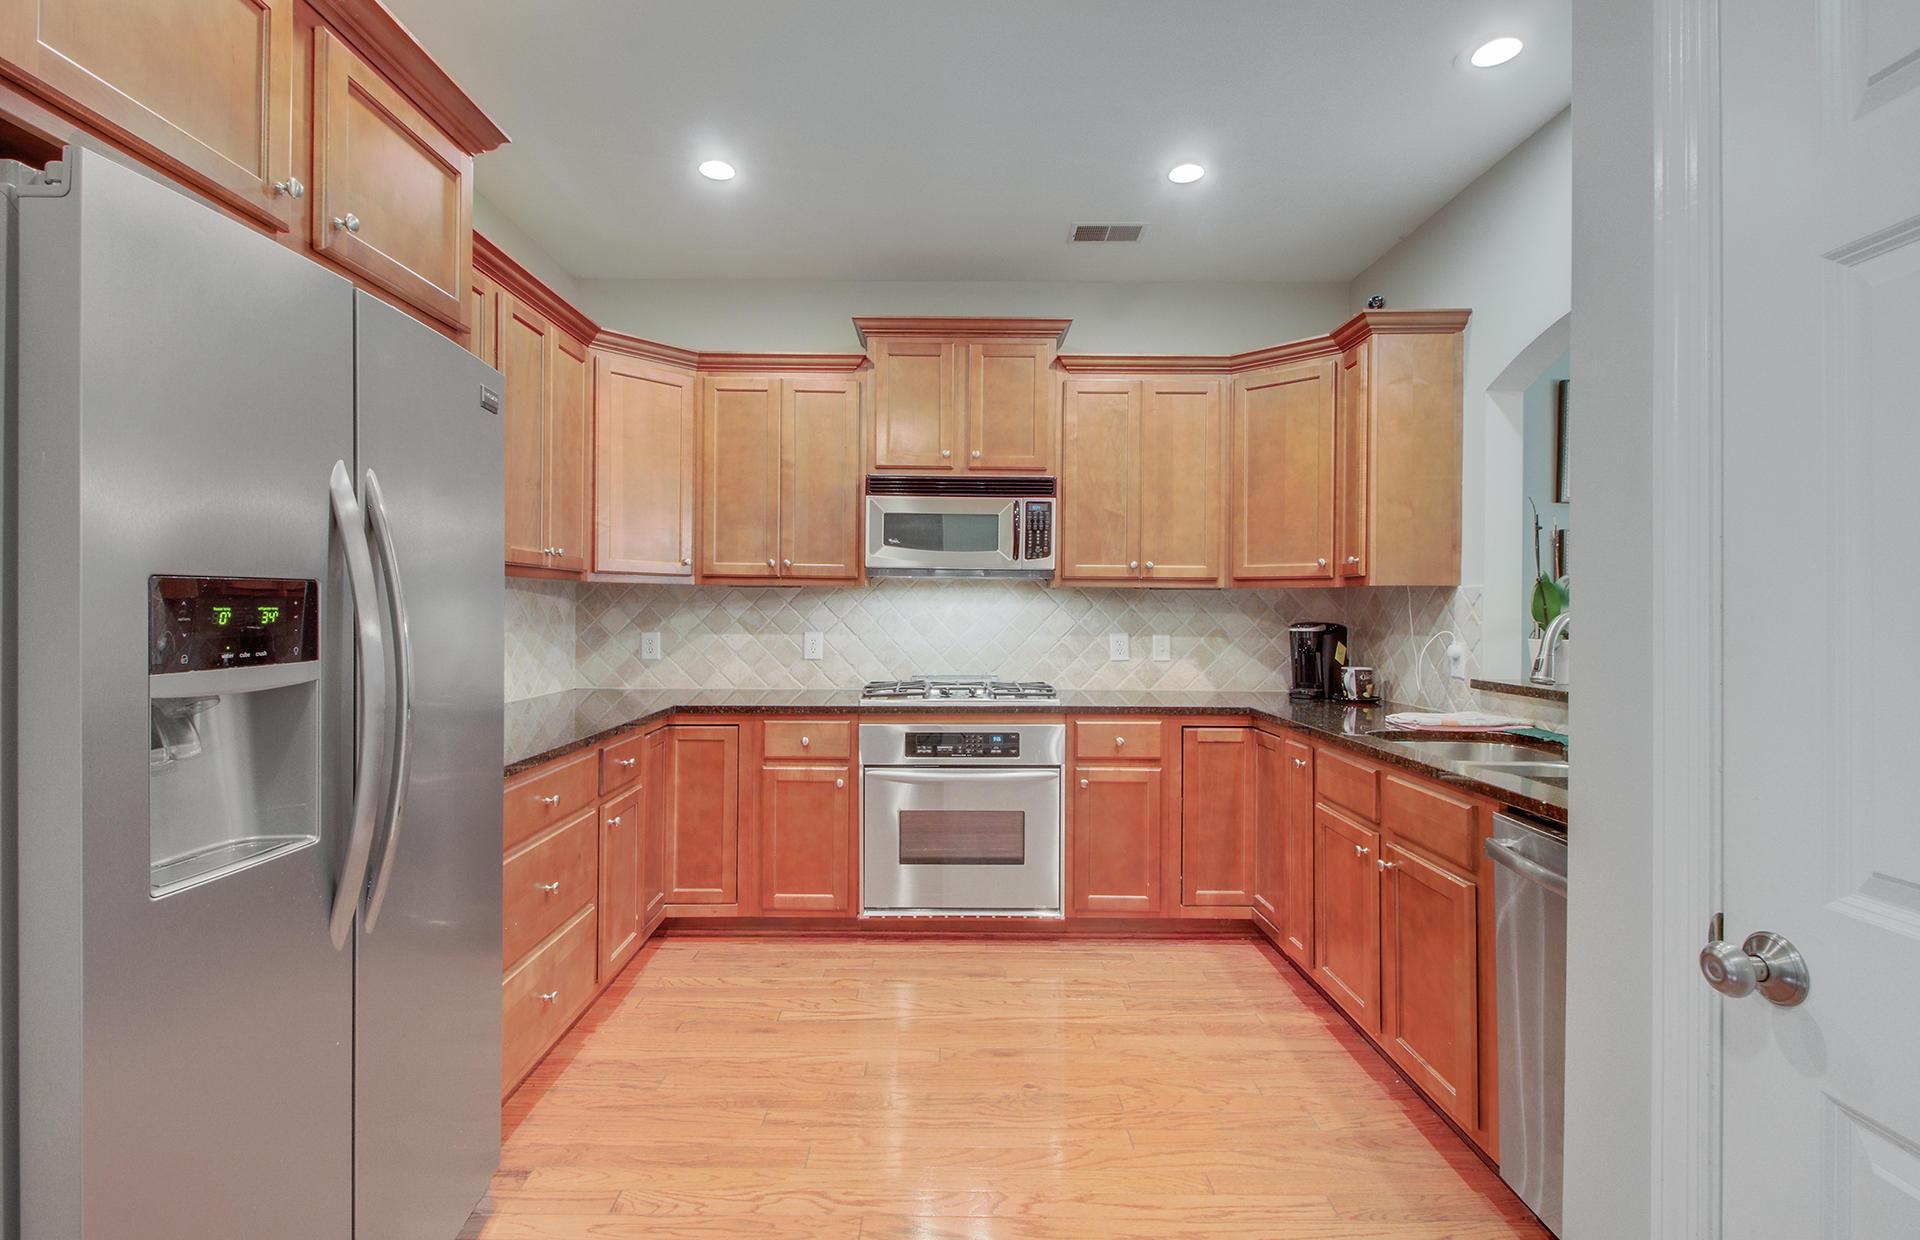 Dunes West Homes For Sale - 145 Fresh Meadow, Mount Pleasant, SC - 9